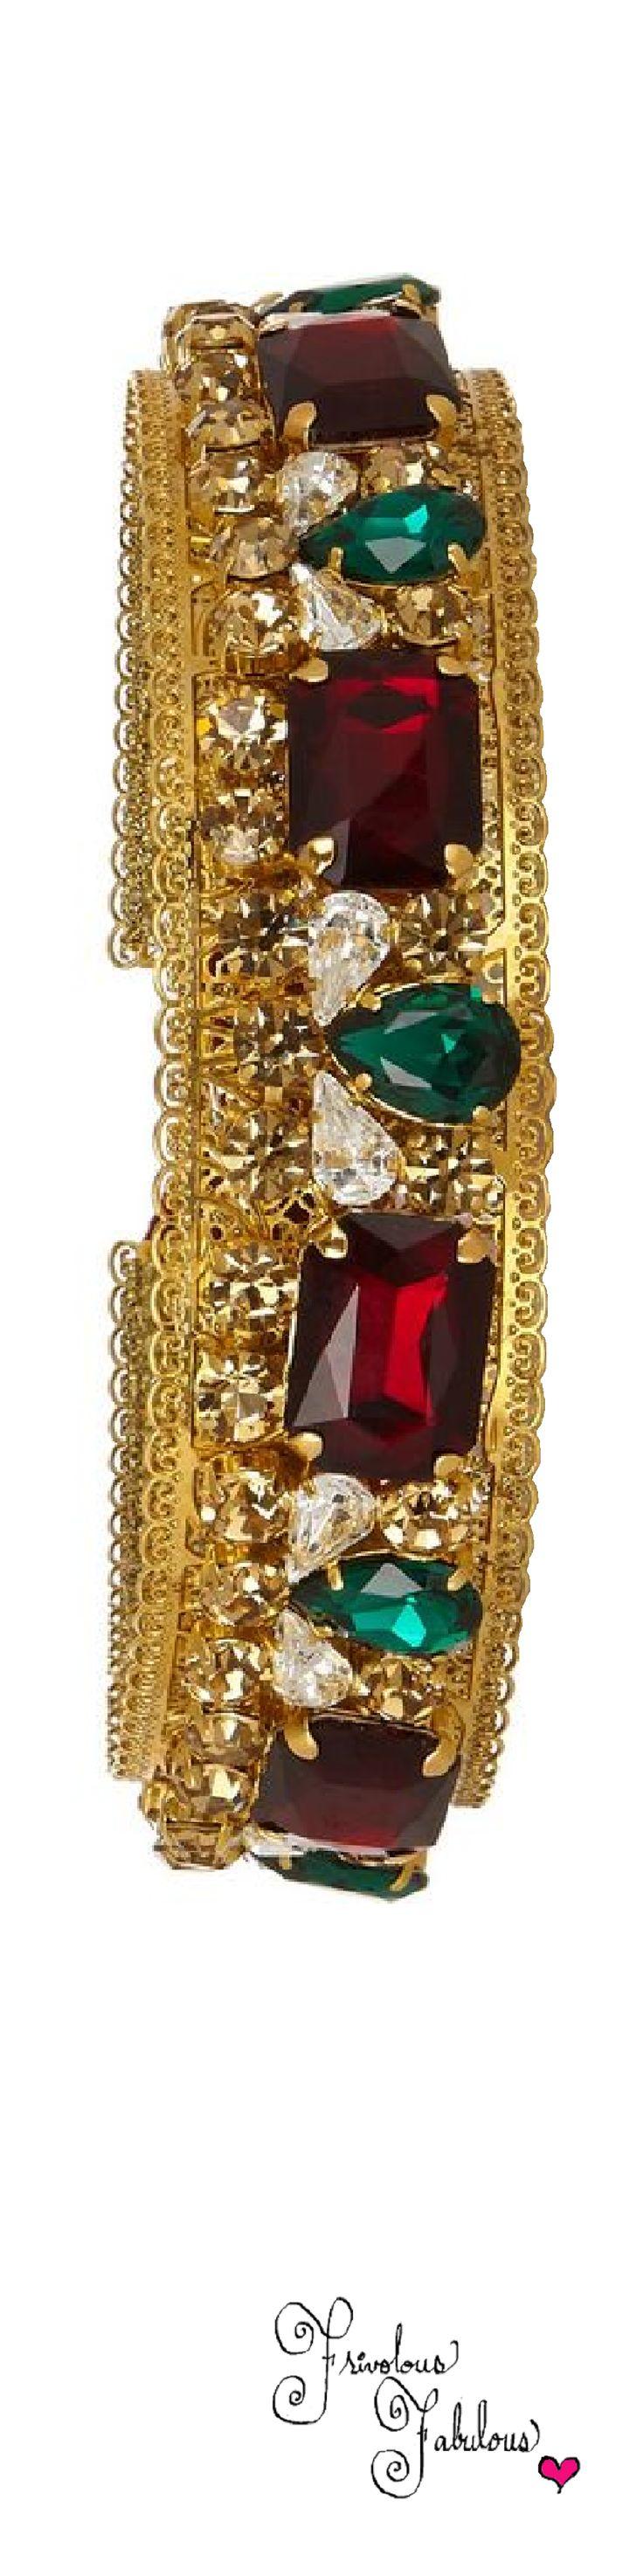 Frivolous Fabulous - Dolce & GabbanaGold Plated Swarovski Crystal Headband